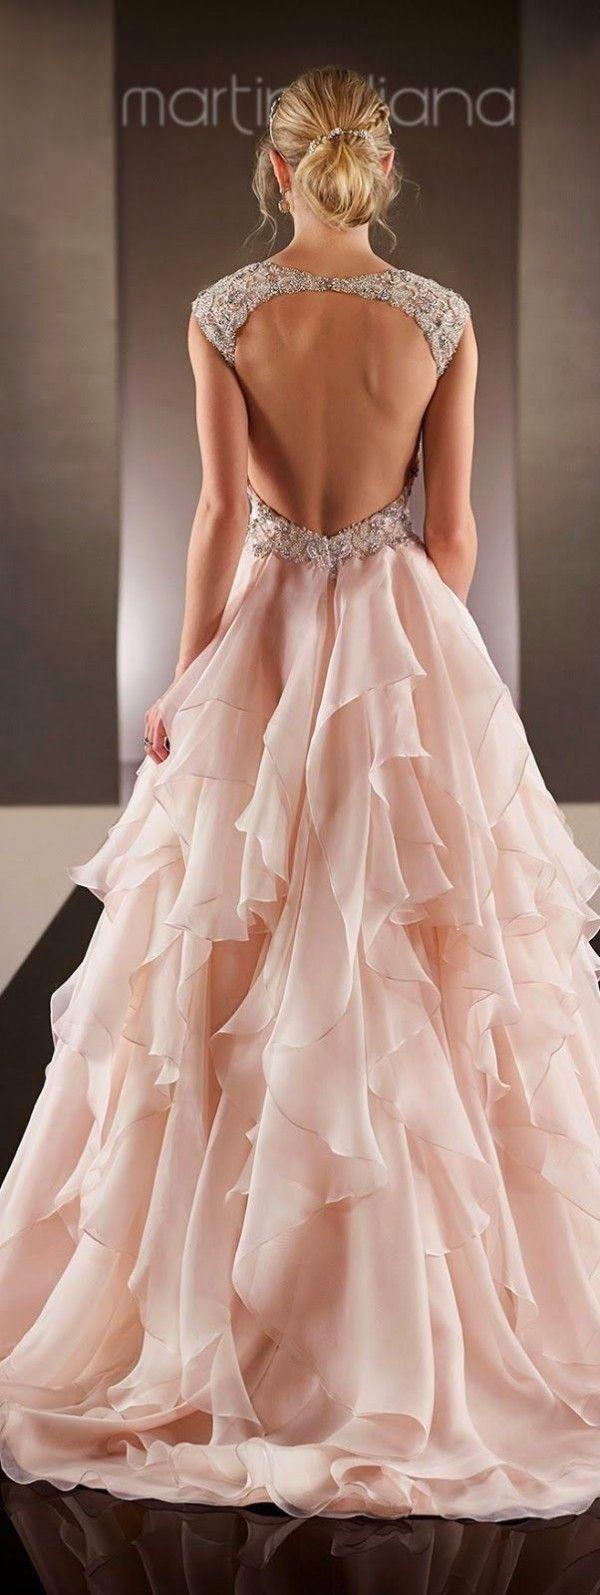 Mejores 34 imágenes de Bridal Dresses en Pinterest | Bodas, Vestidos ...